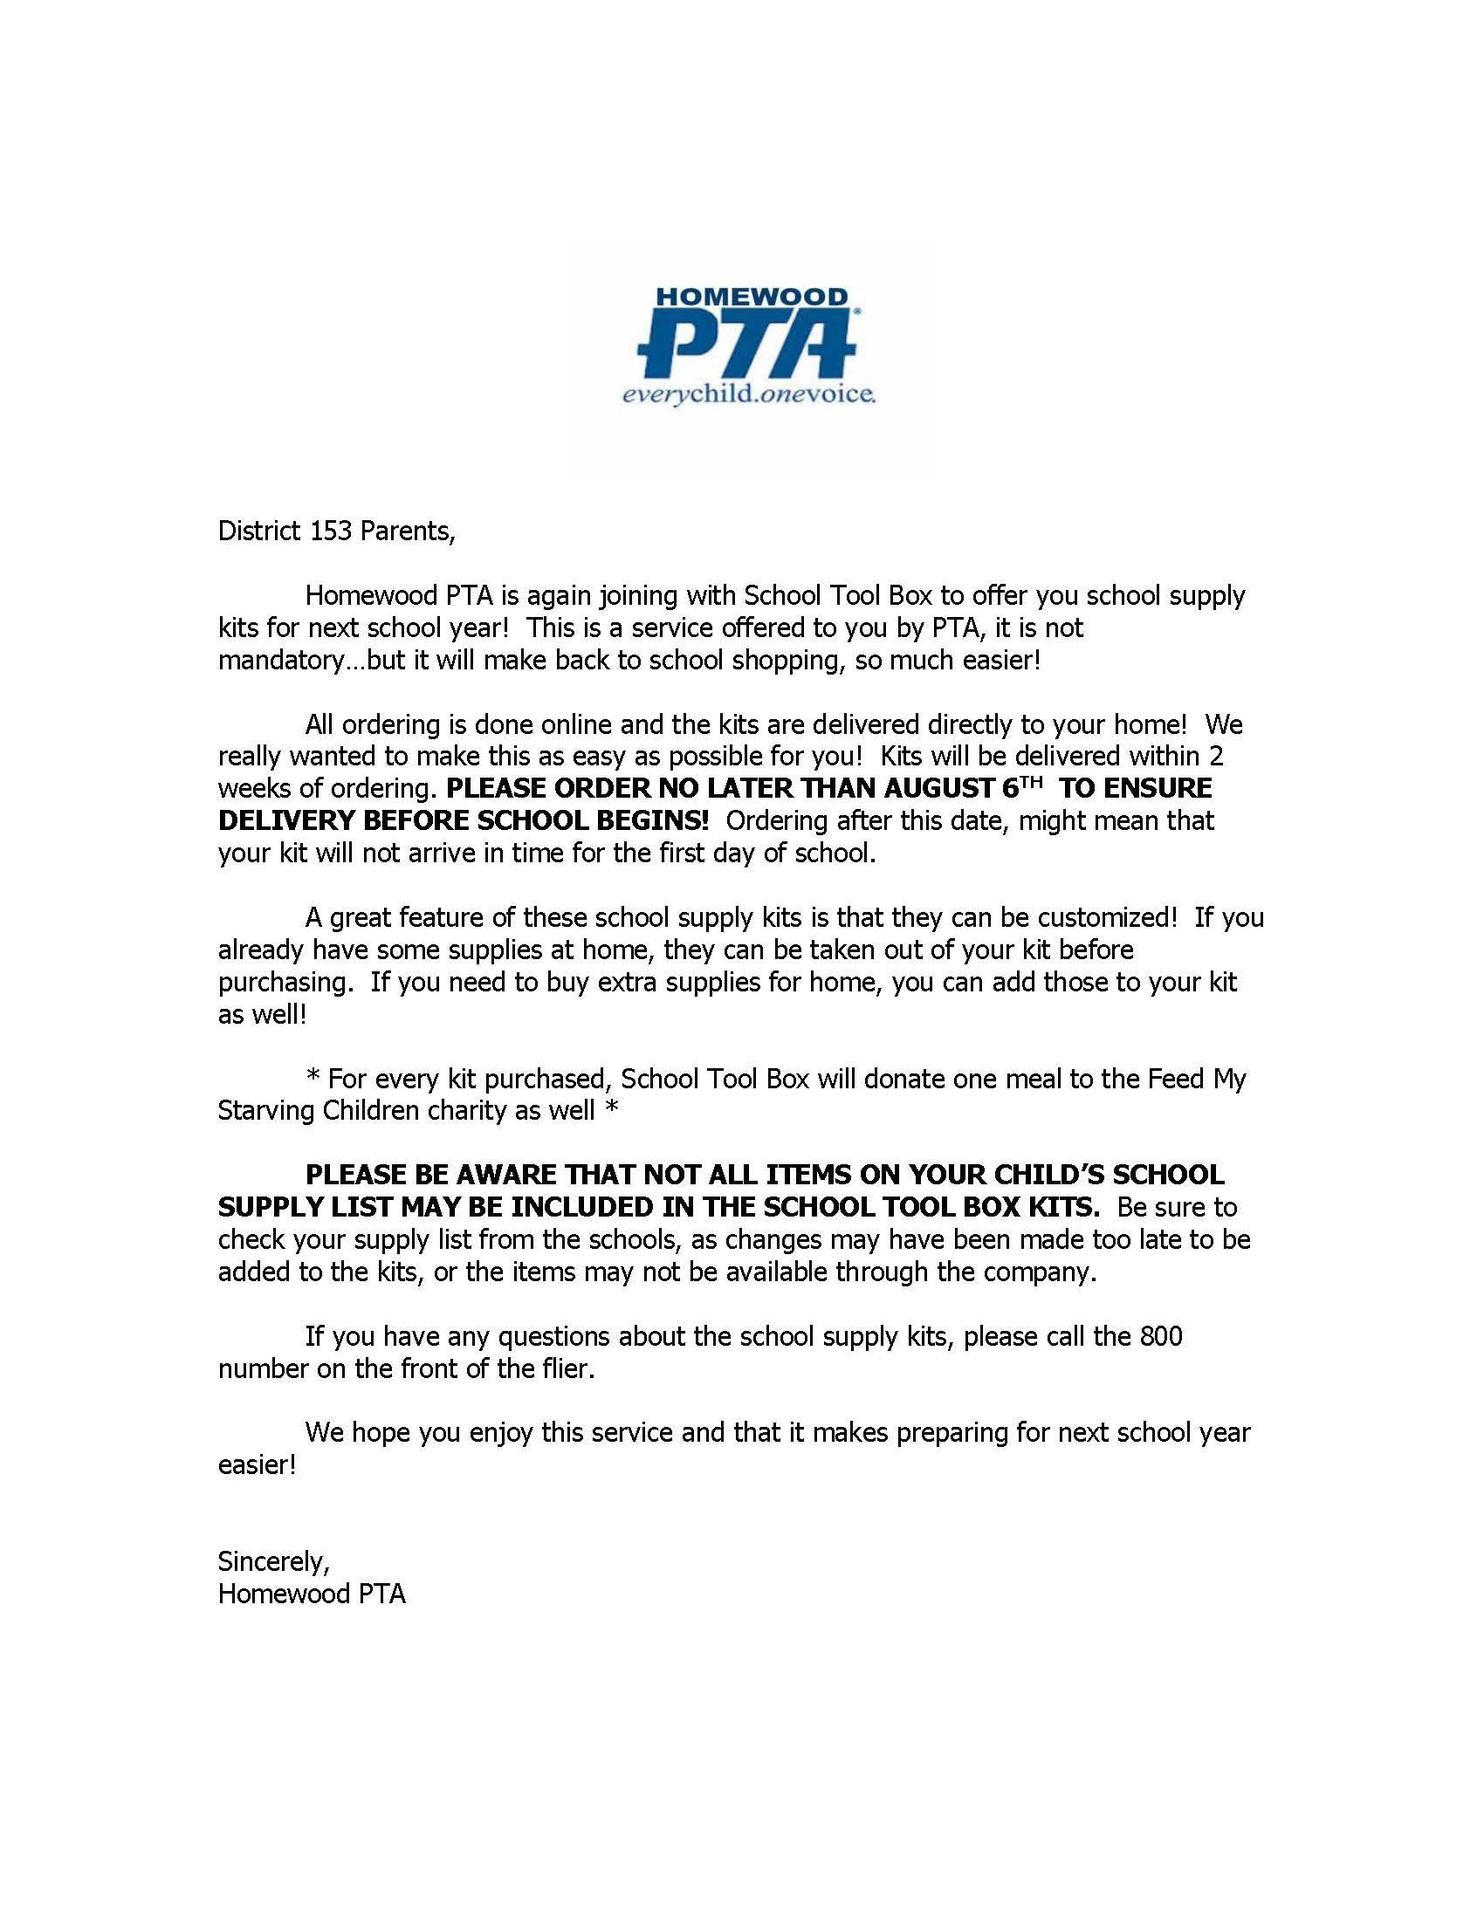 PTA letter